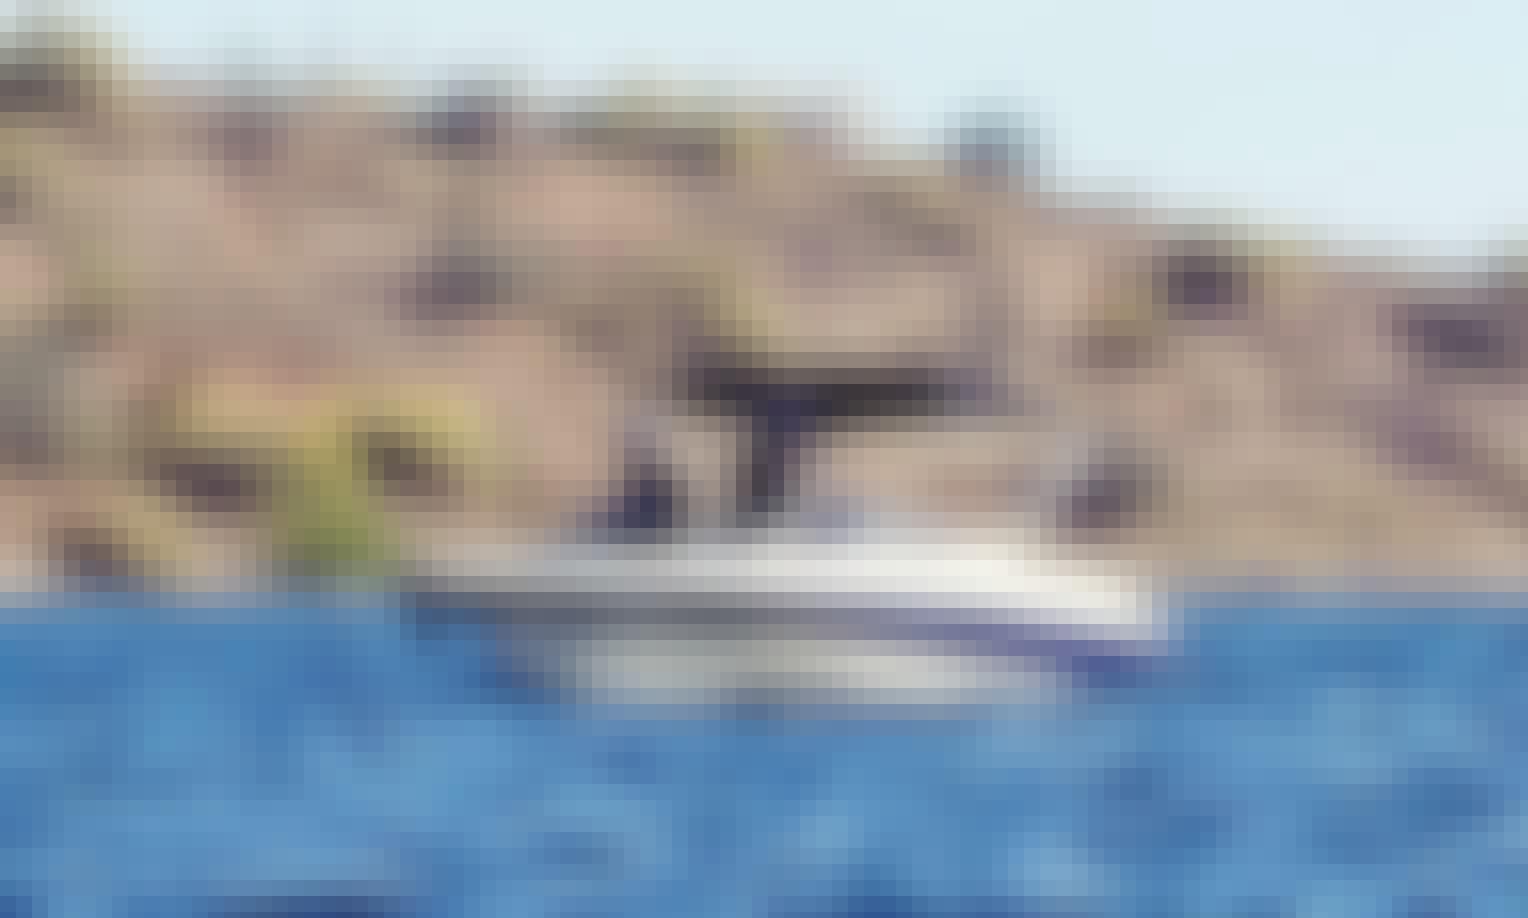 20' Bayliner Boat Rental for 8 People in El Mirage, Arizona